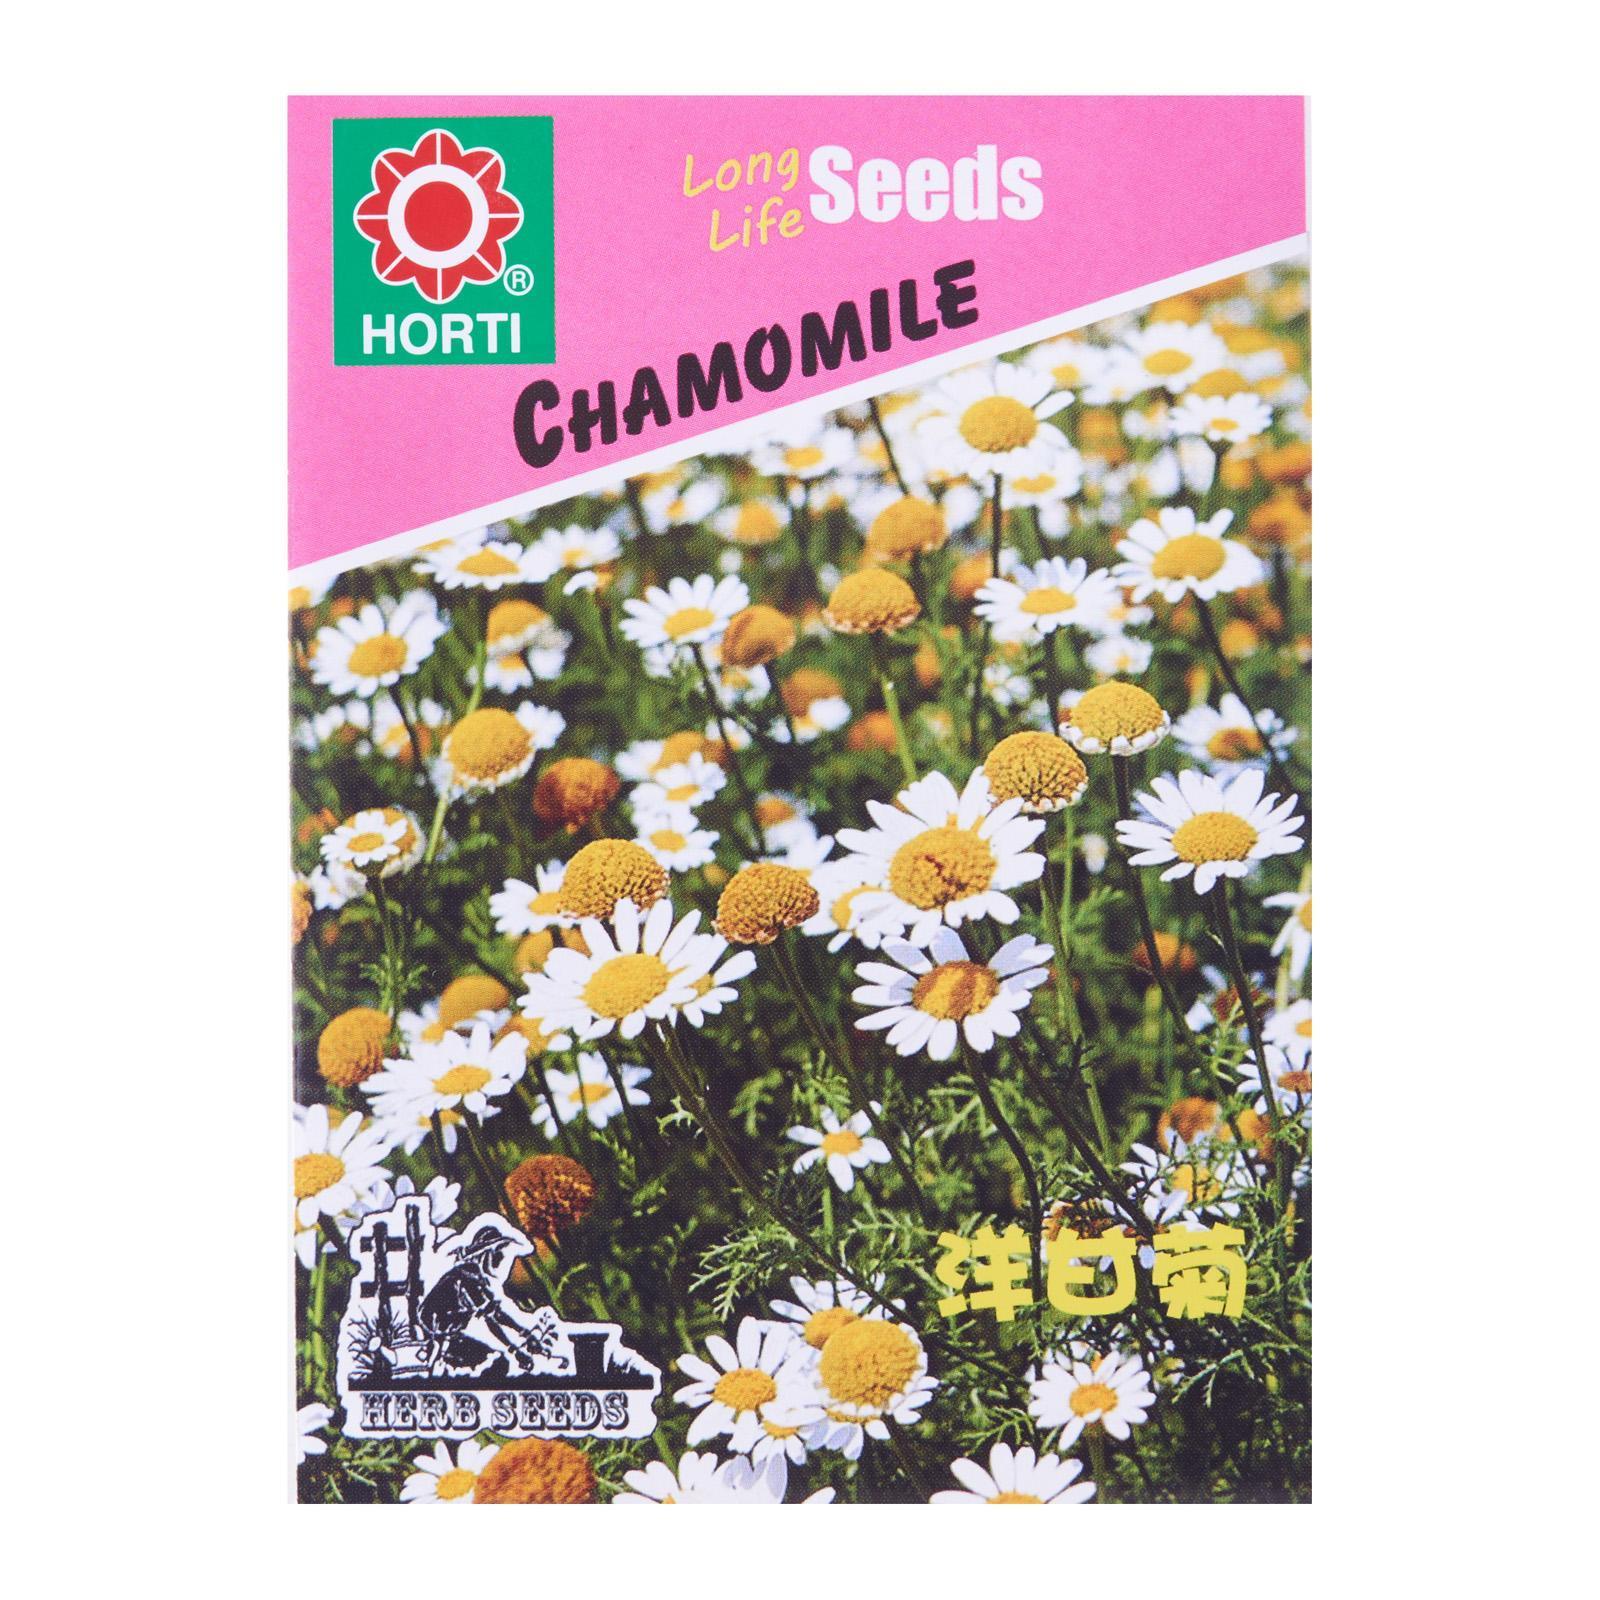 Horti Chamomile - Seeds